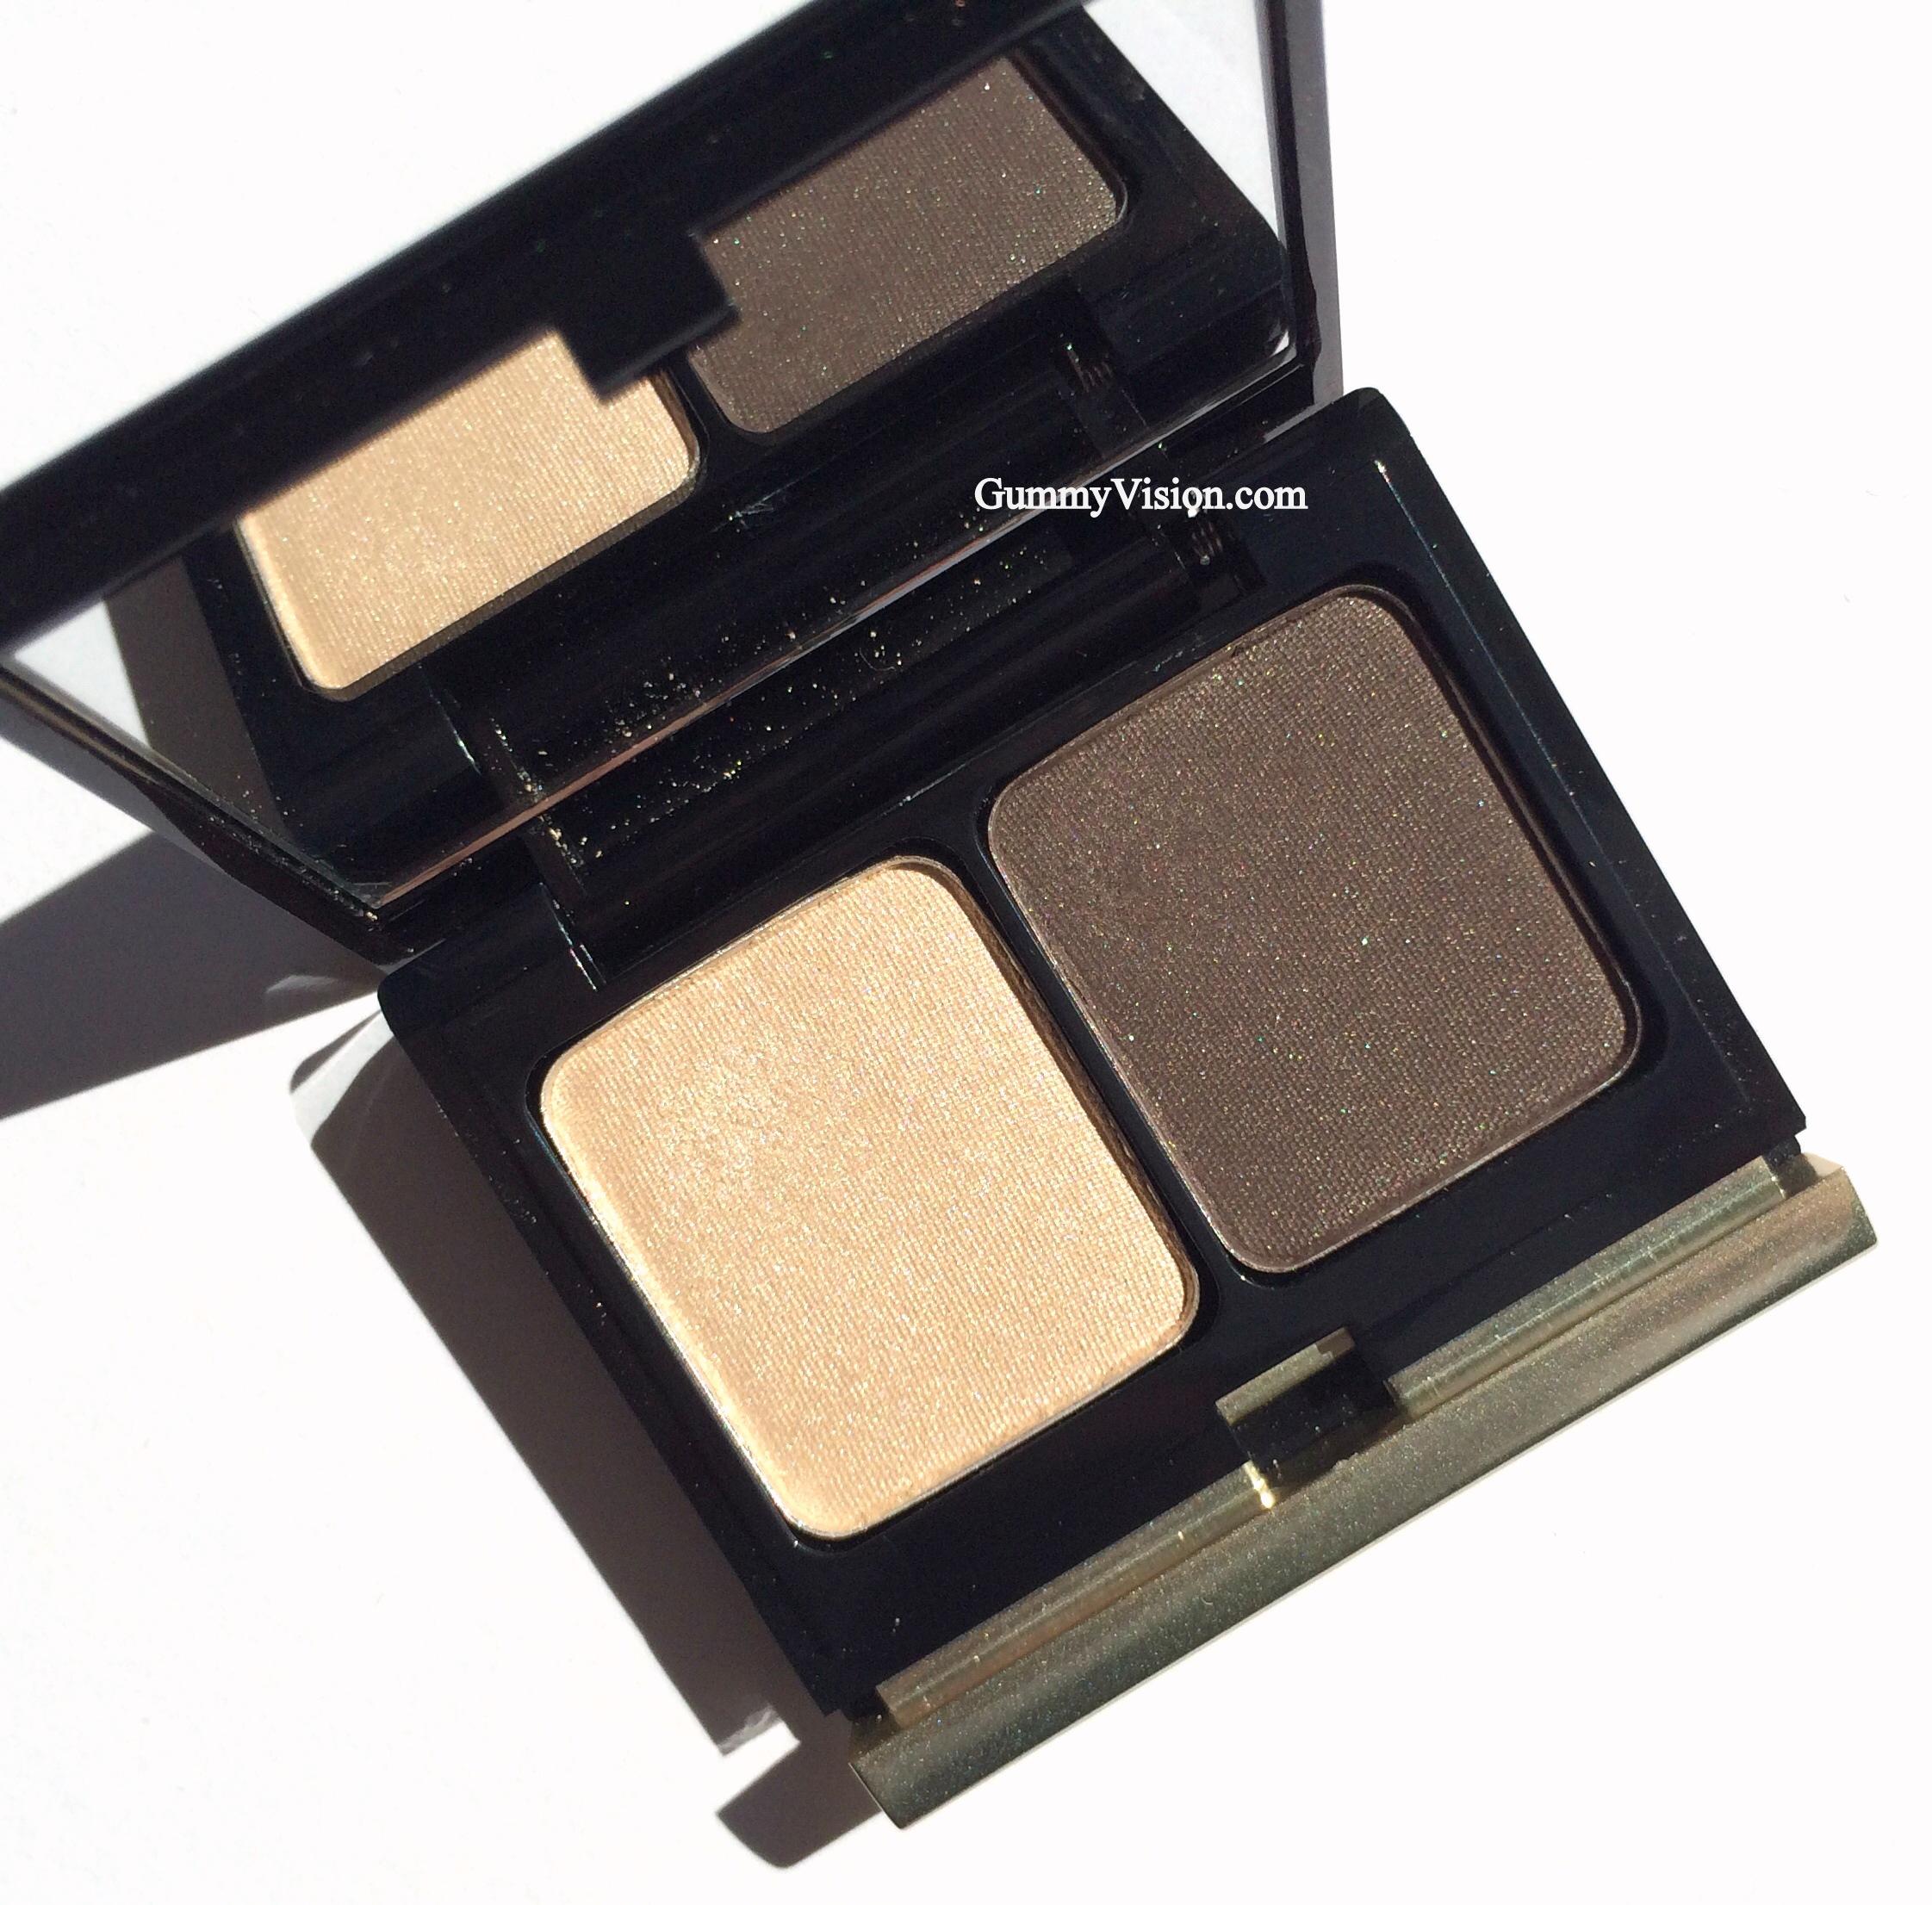 Kevyn Aucoin Eyeshadow Duo in #207